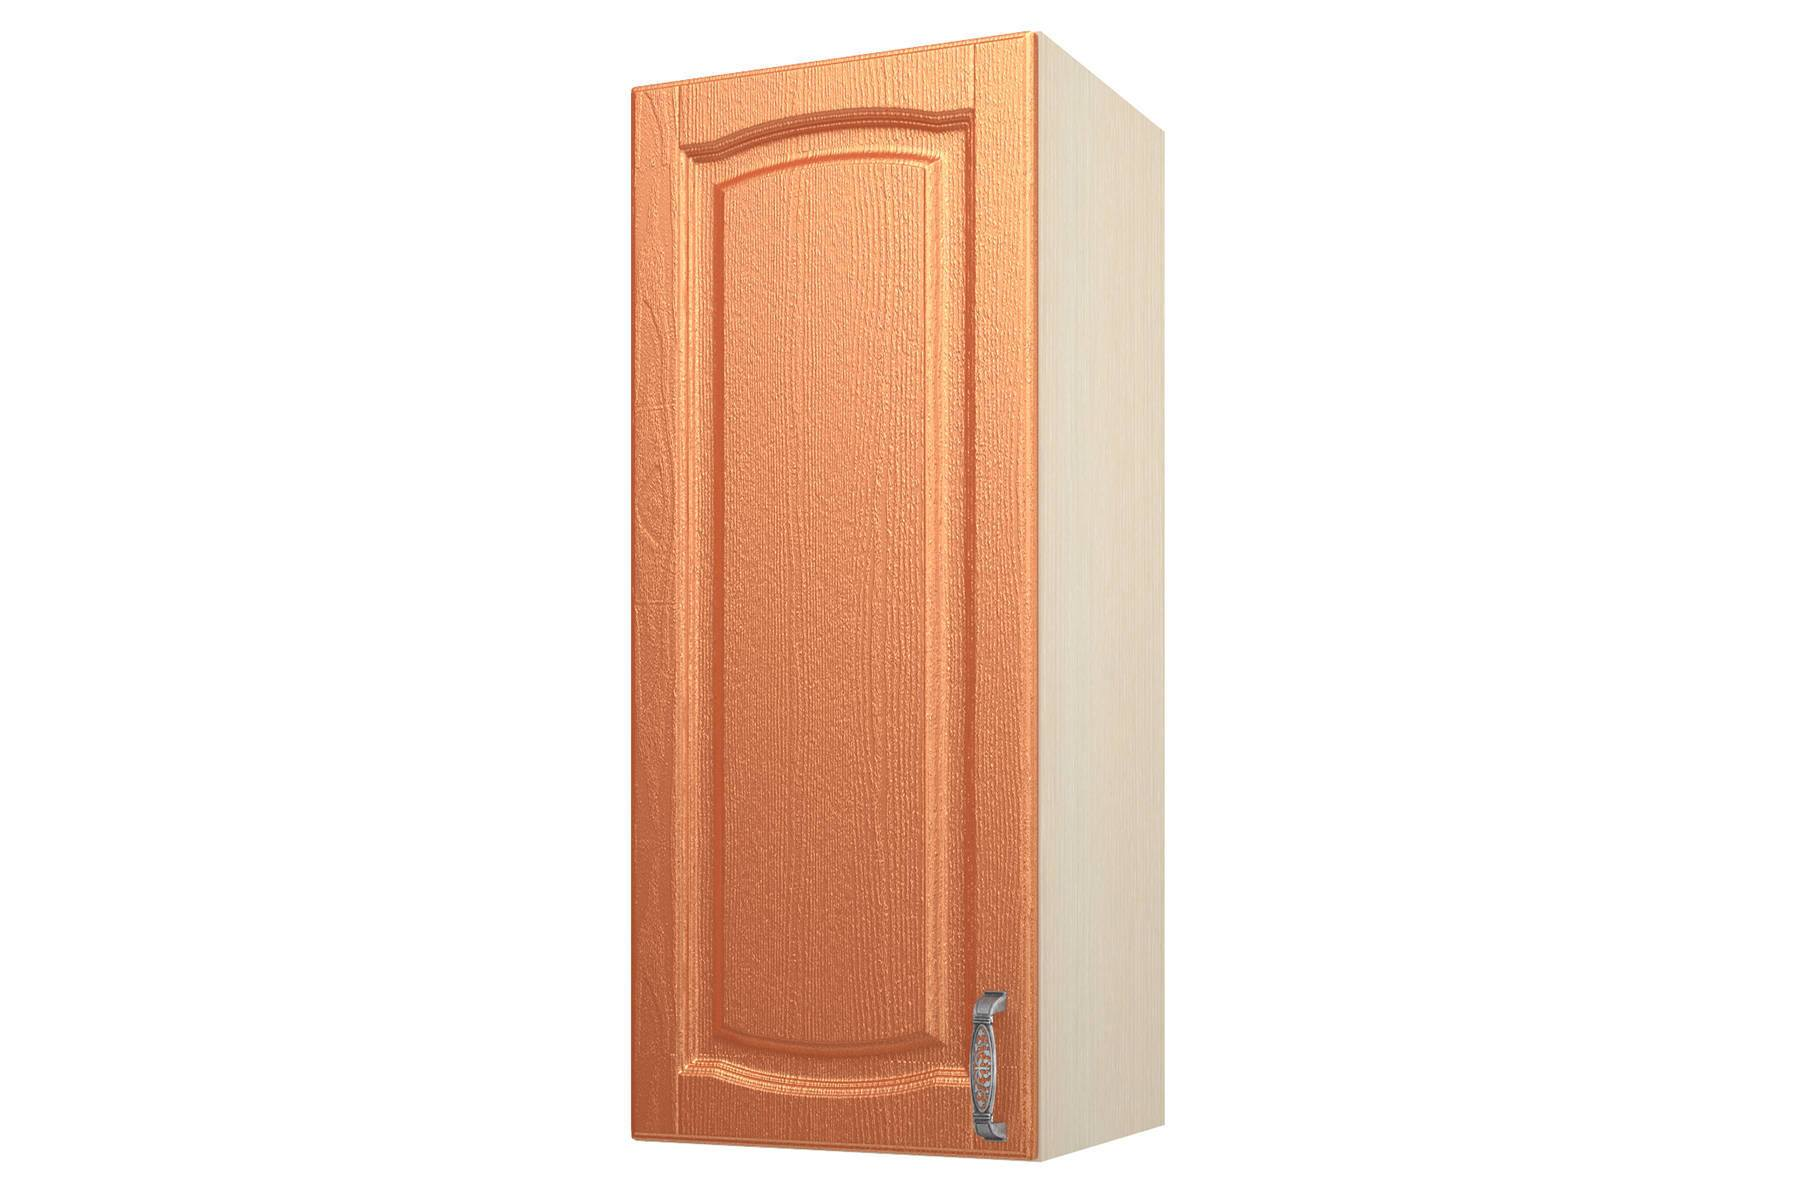 Равенна ART Шкаф навесной 40, (Н-96), 1 дверь равенна art шкаф навесной 40 н 96 1 дверь